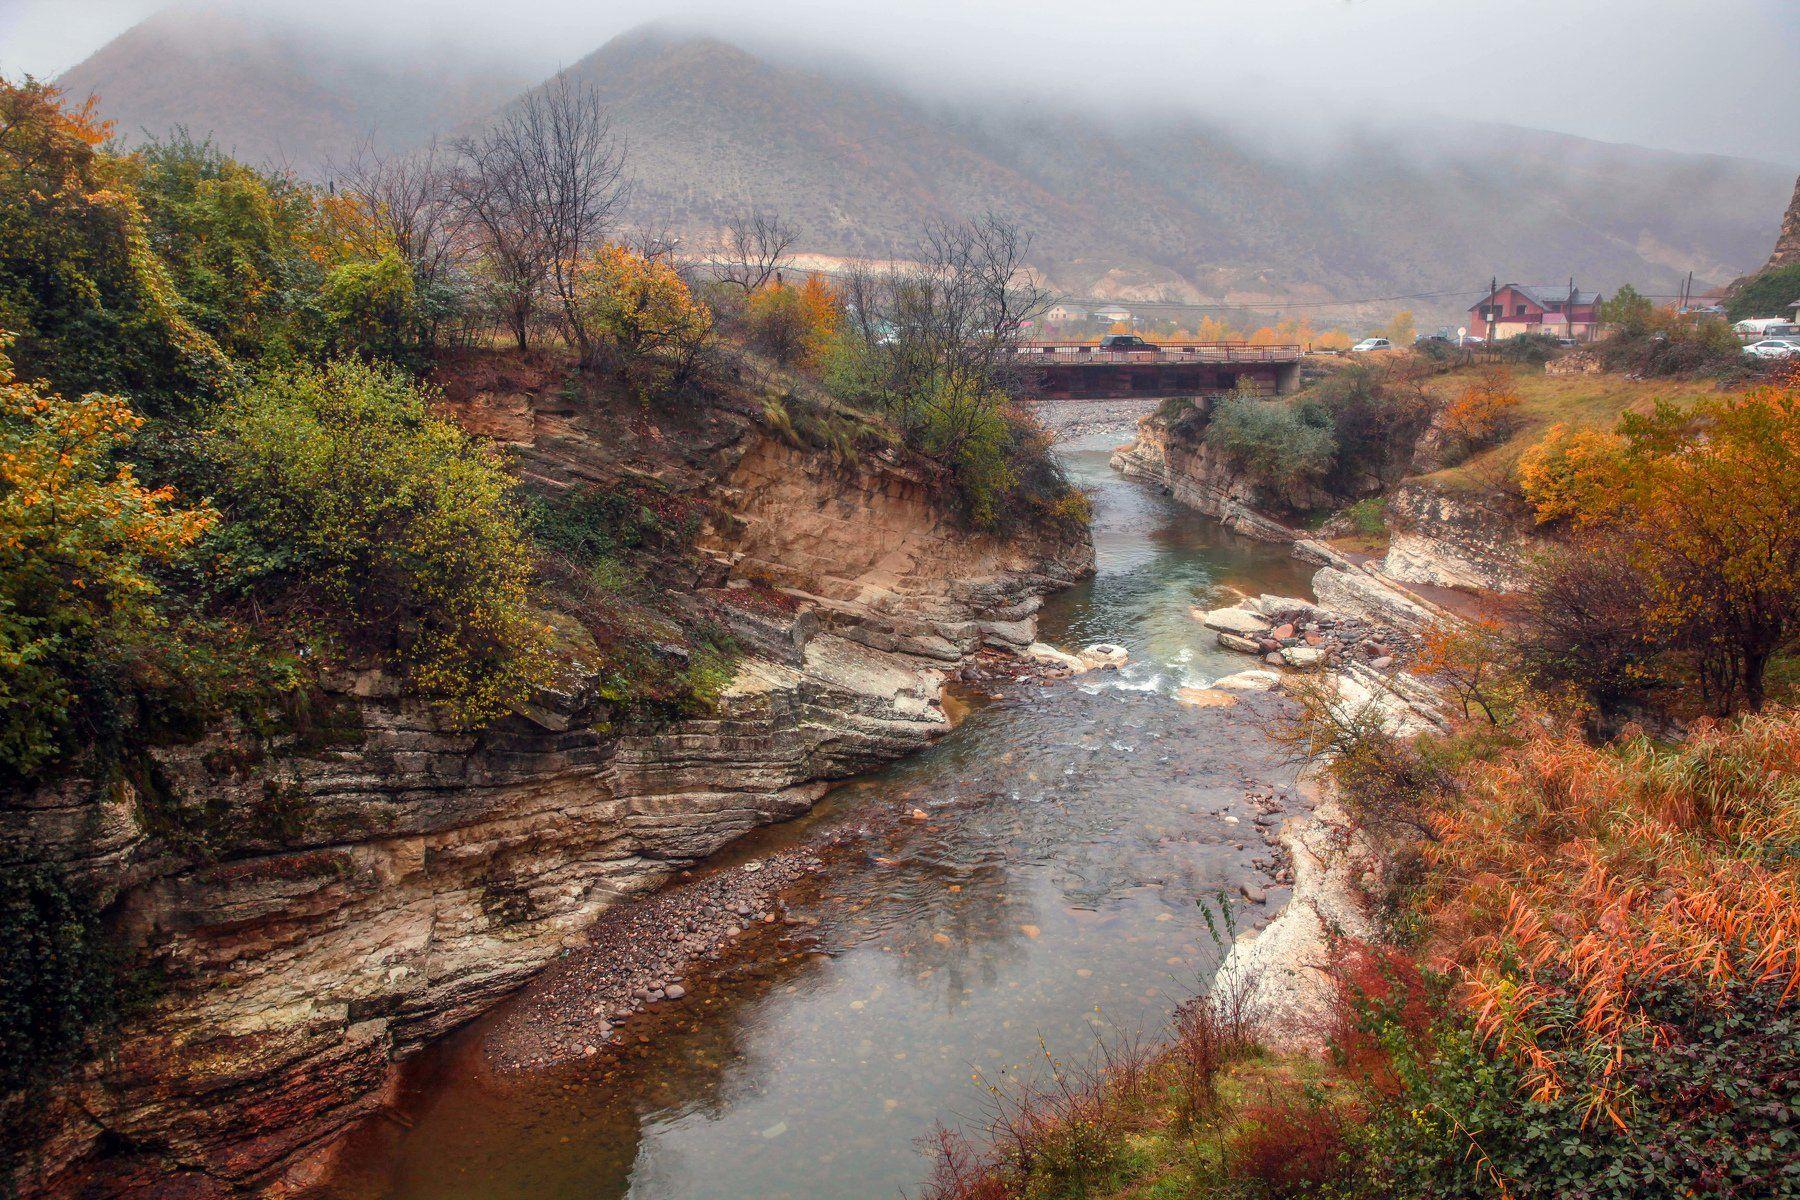 река,горы,осень,природа,дагестан., Марат Магов